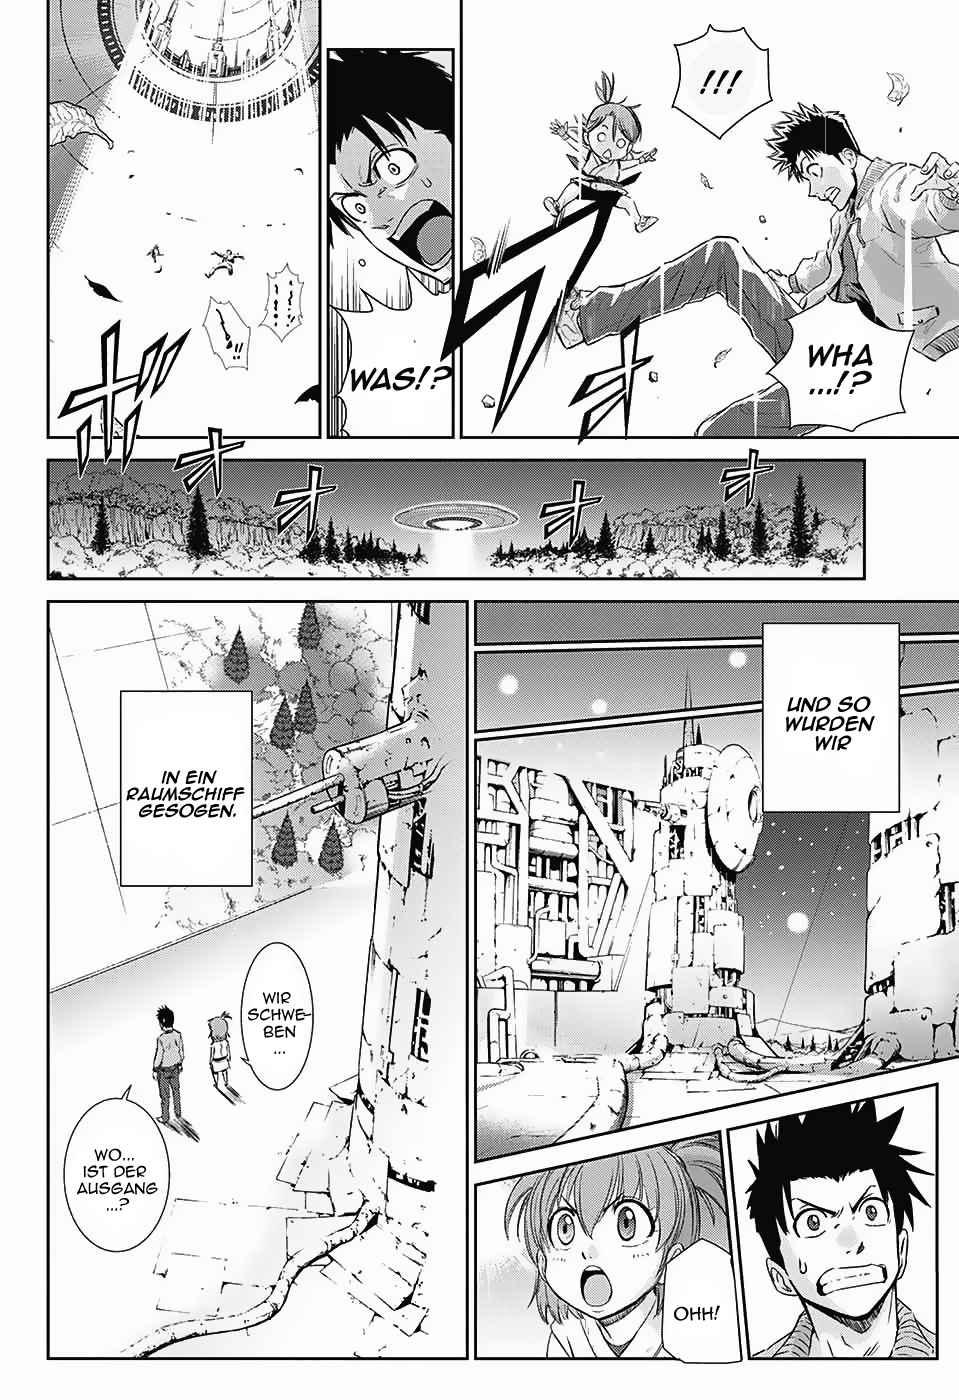 https://wie.mangadogs.com/comics/pic/42/810/286981/6e1e5a4b03f72aaaabb04228eaf56600.jpg Page 9